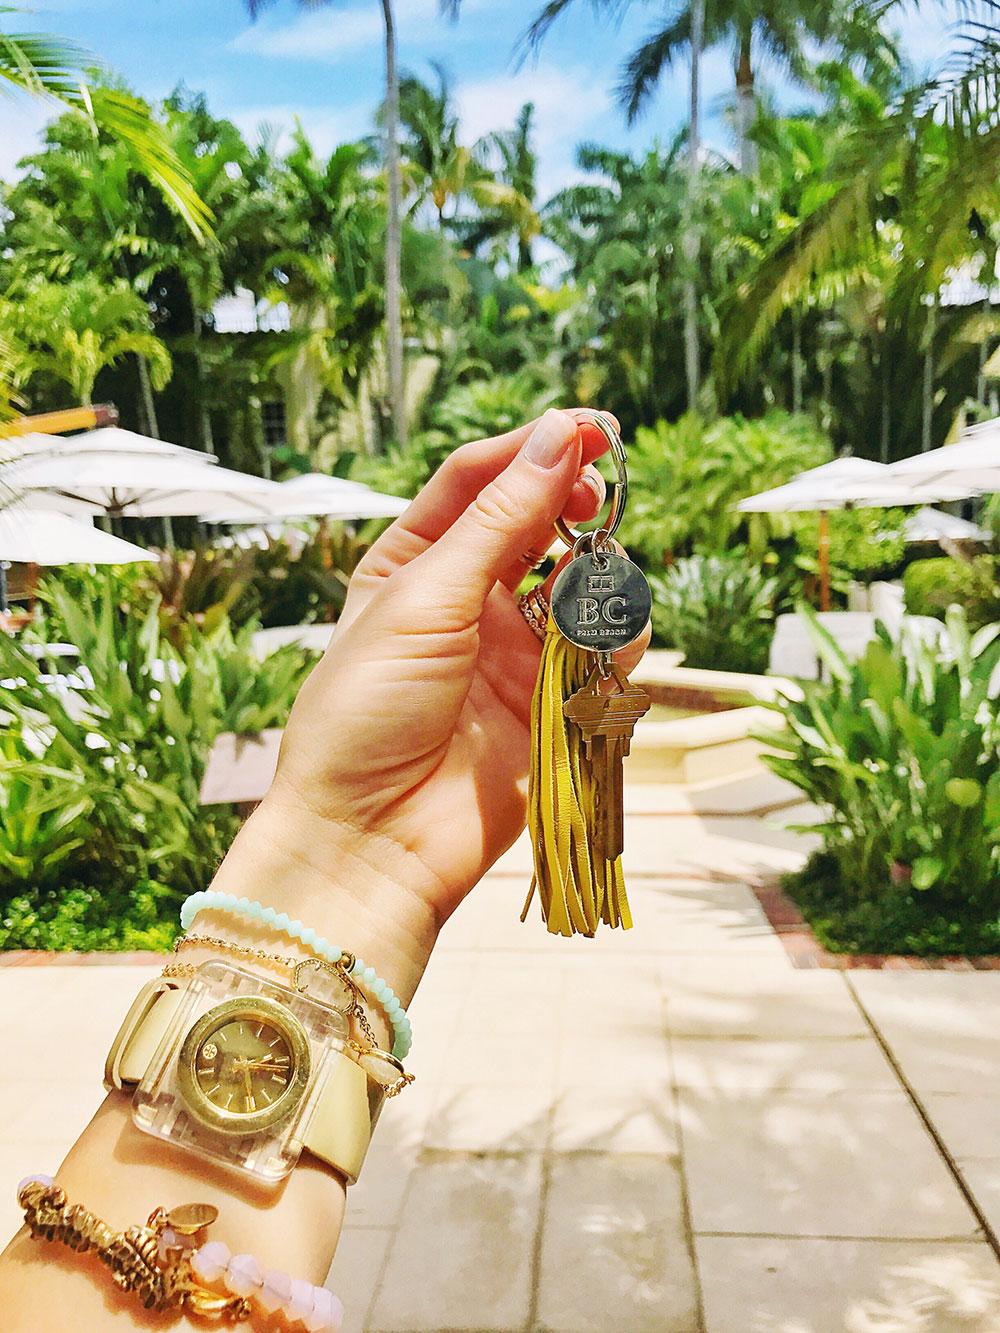 brazilian-court-hotel-palm-beach-review